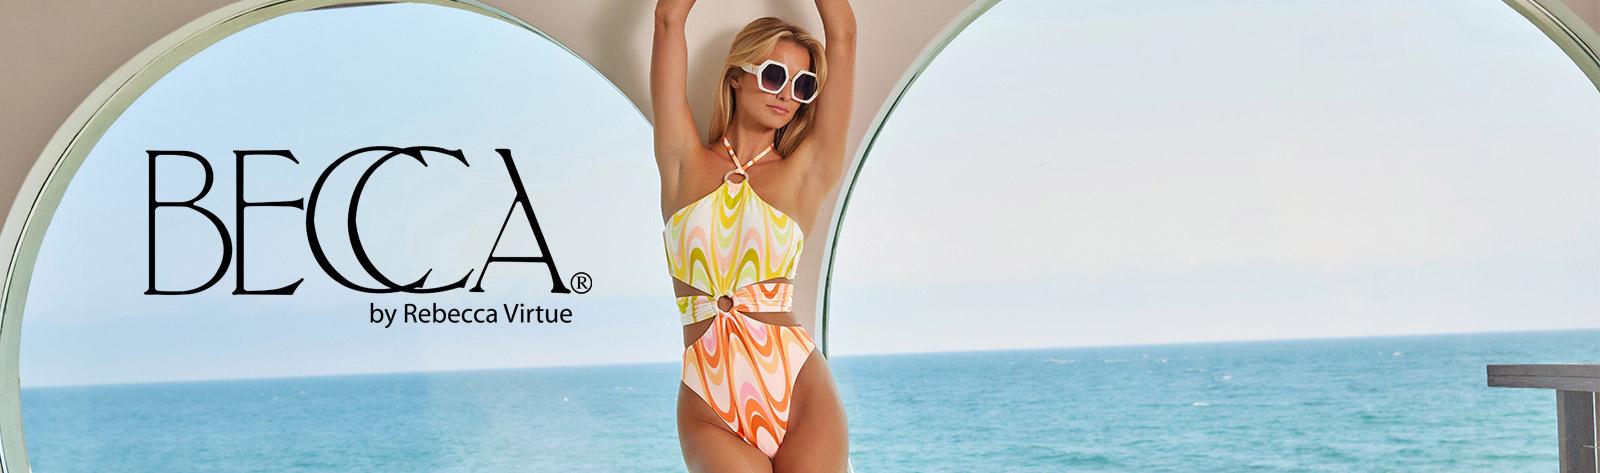 1d9f8483e0ee8 Shop for Becca Swimwear for Women - Swimwear by Becca - HerRoom